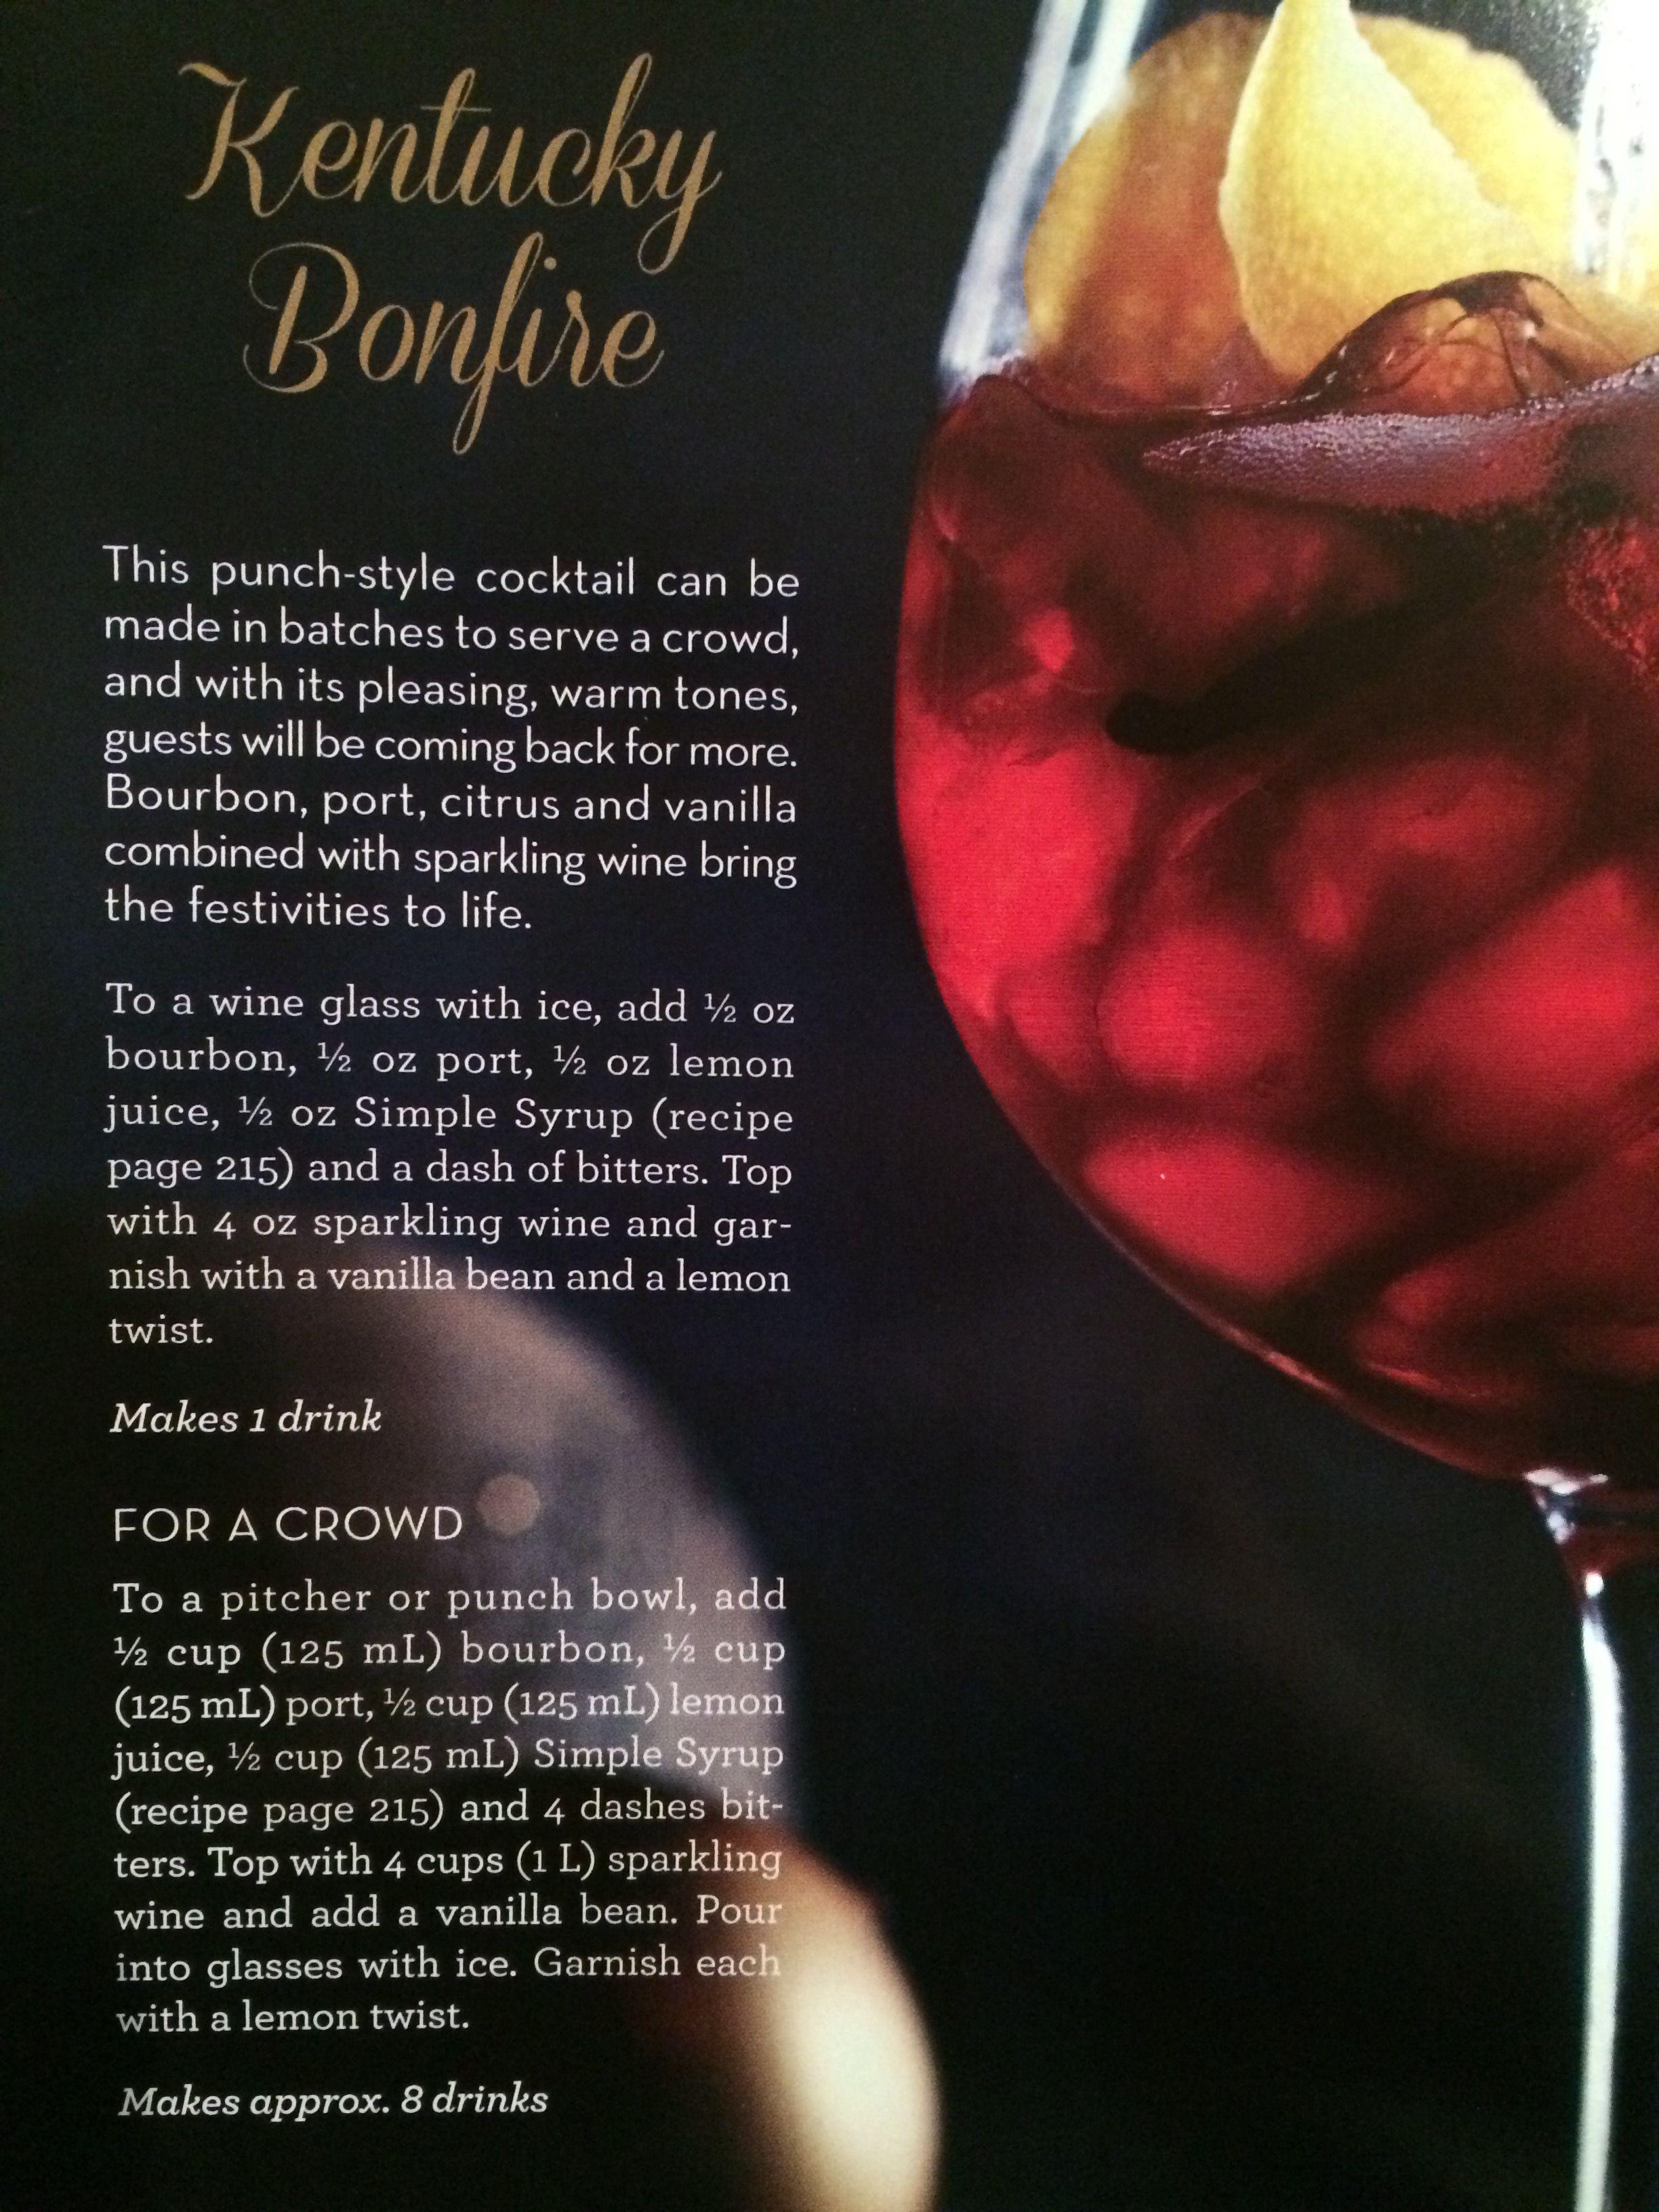 Kentucky Bonfire Sparkling Wine Citrus Wine Glass